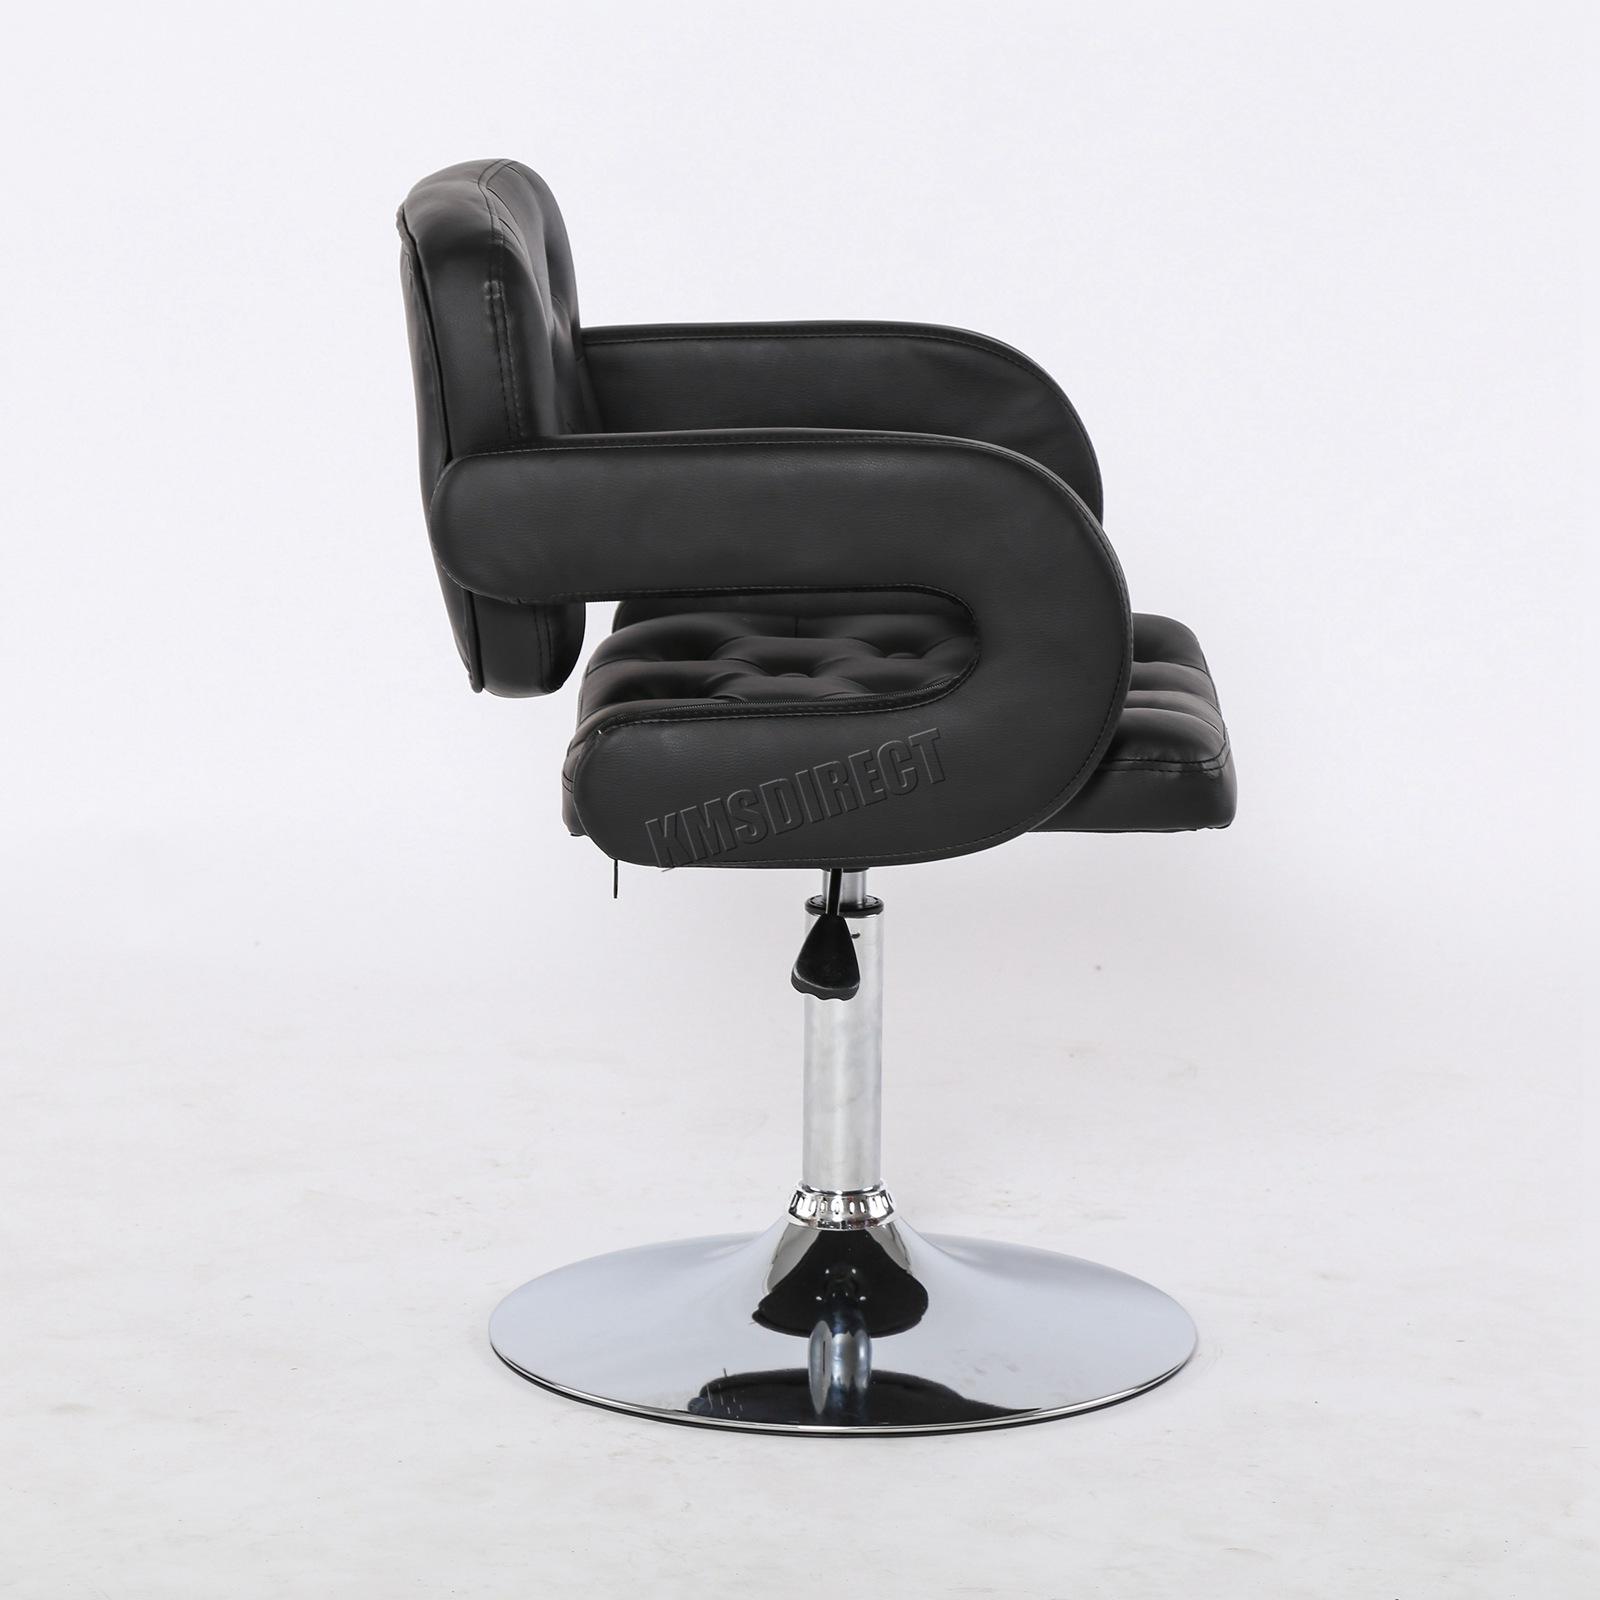 WestWood-Beauty-Salon-Chair-Barber-Hairdressing-Hair-Cut-PU-Leather-Modern-SC02 miniatuur 14